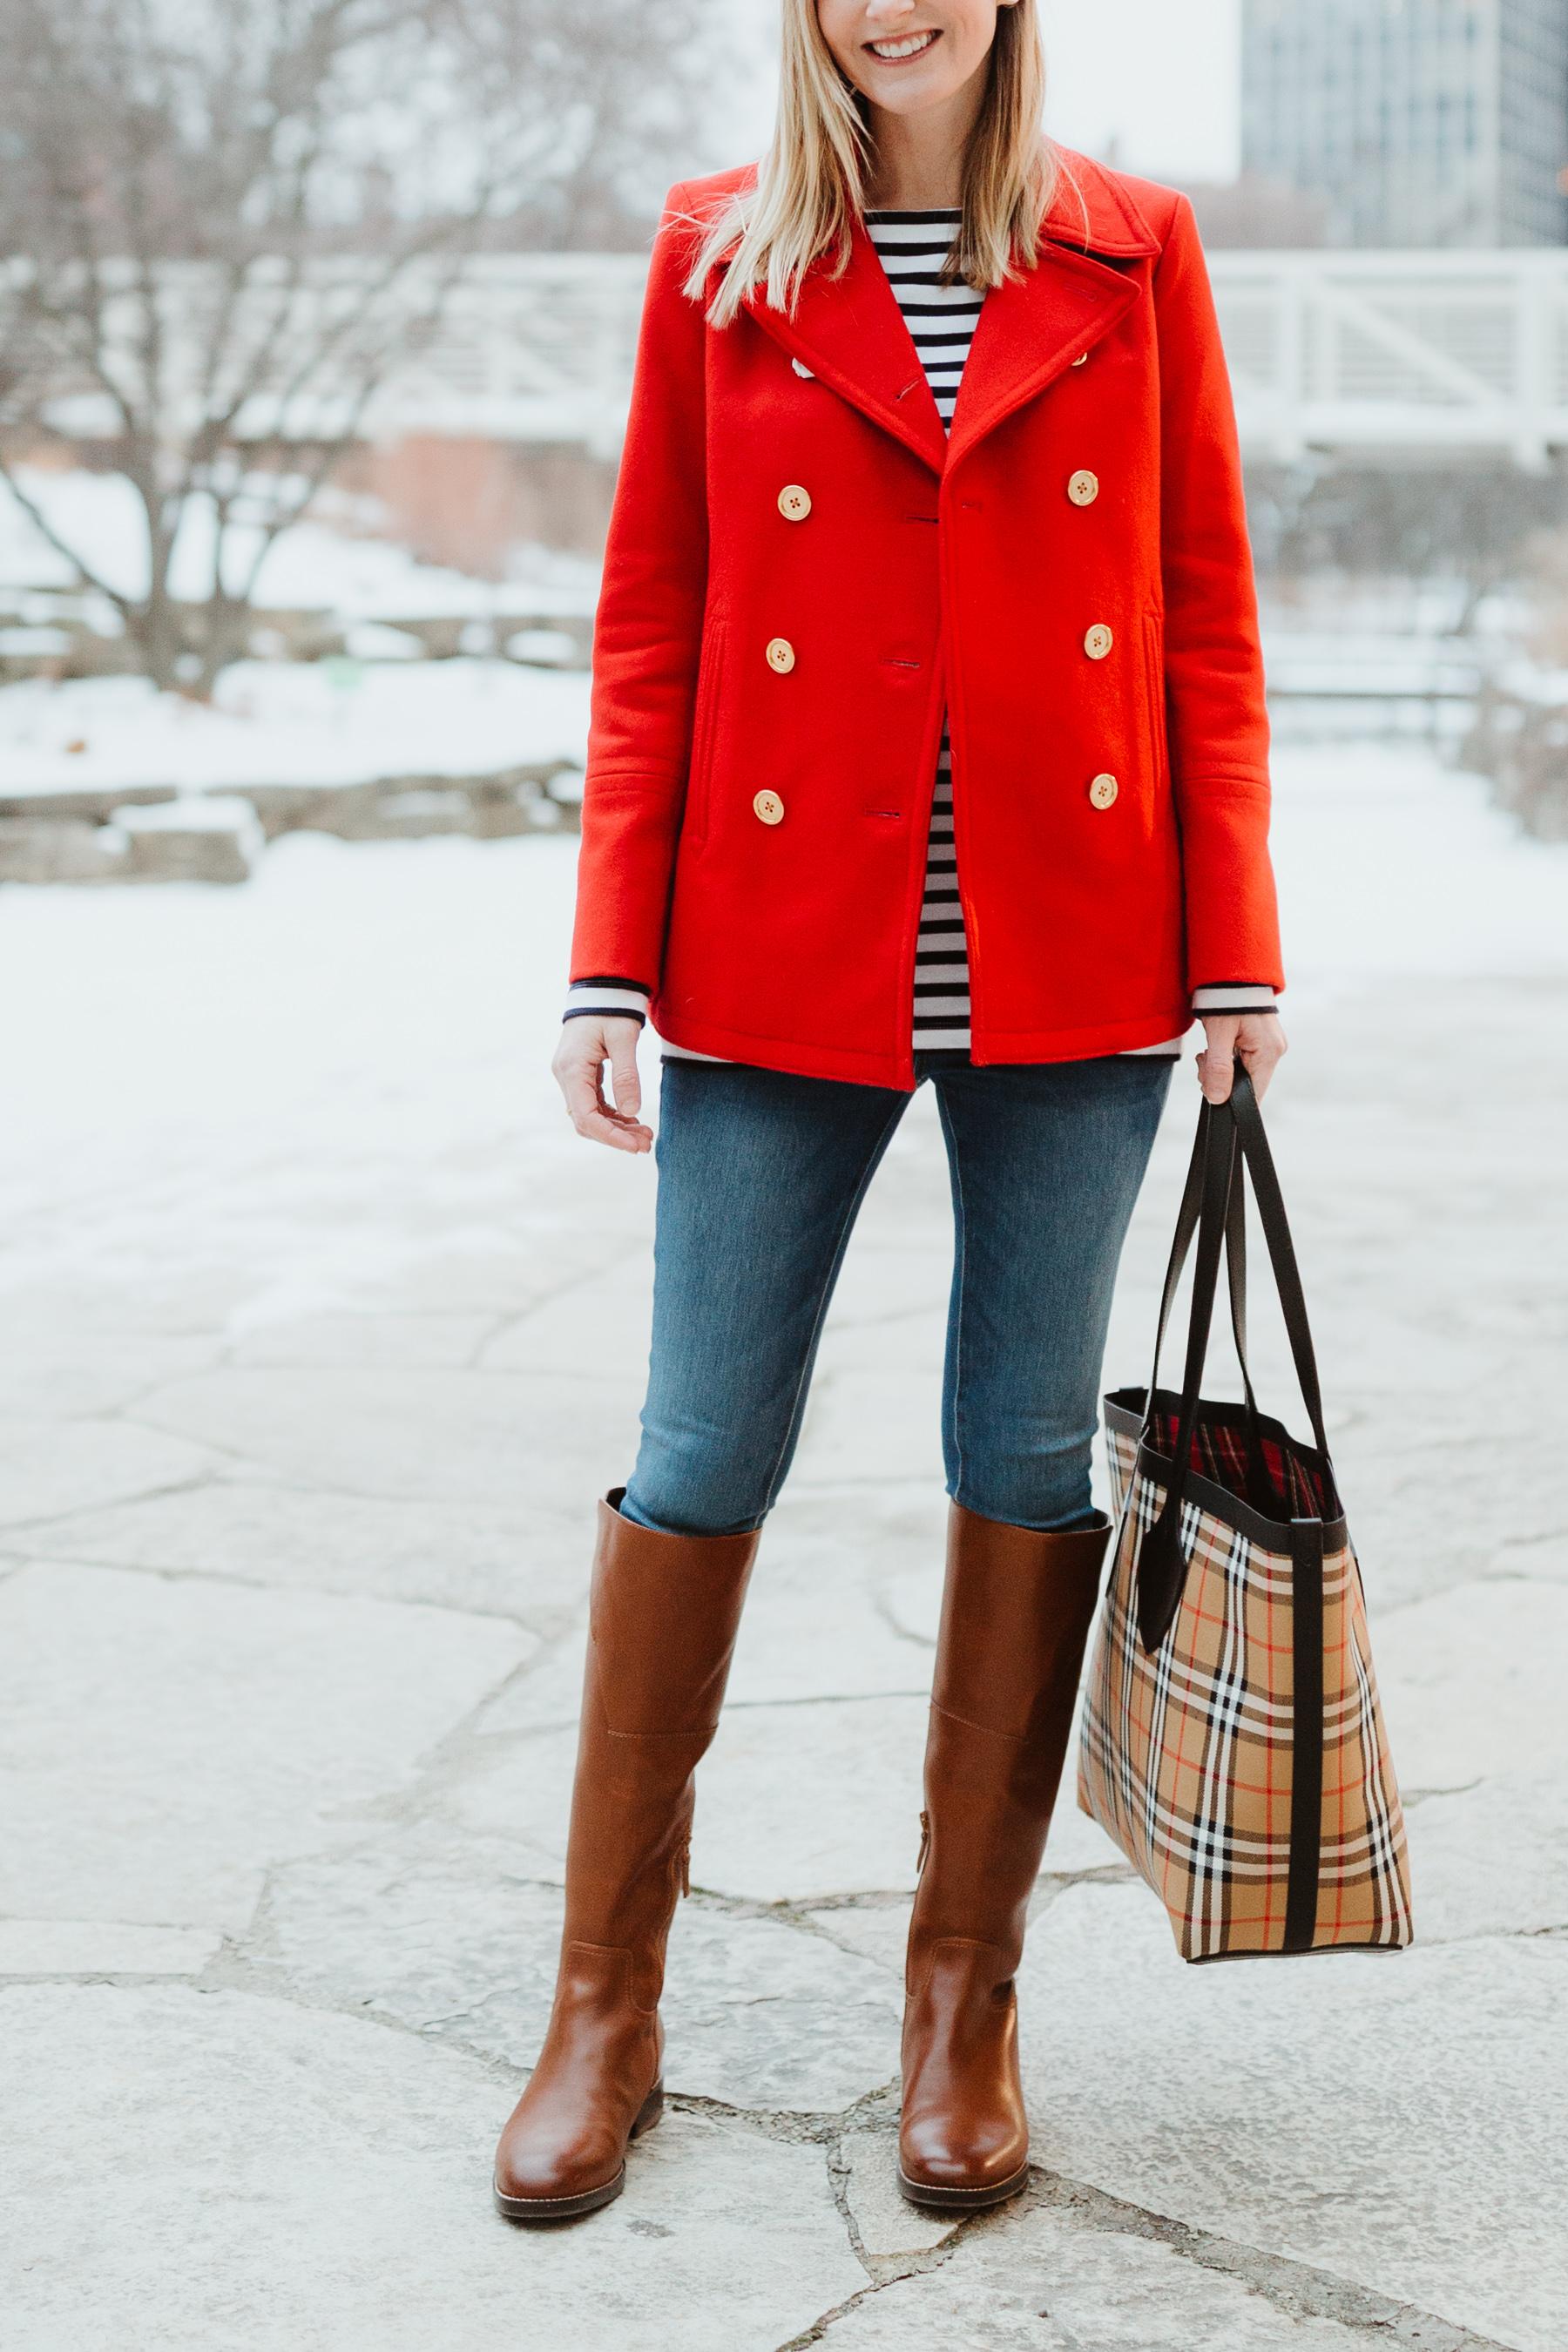 classic winter staples